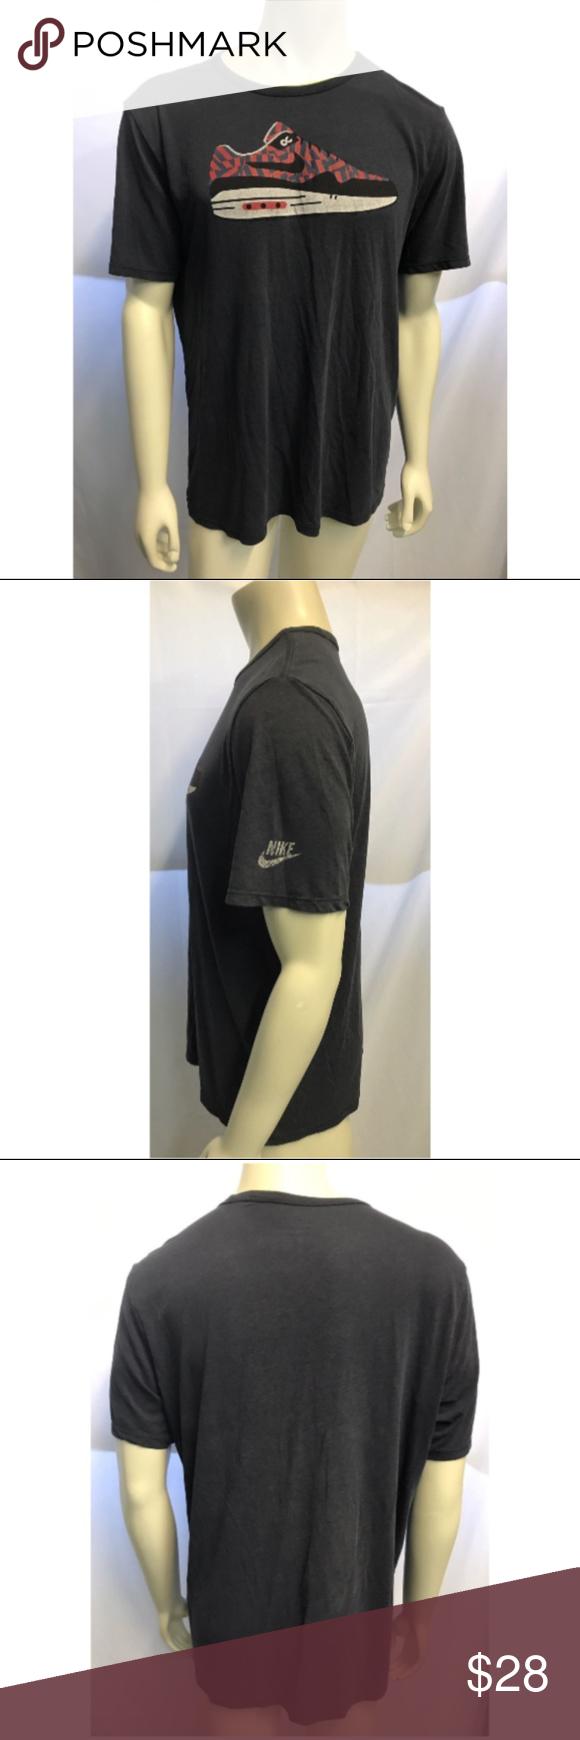 Men's Vintage Nike Air Max 1 Athletic T Shirt XL